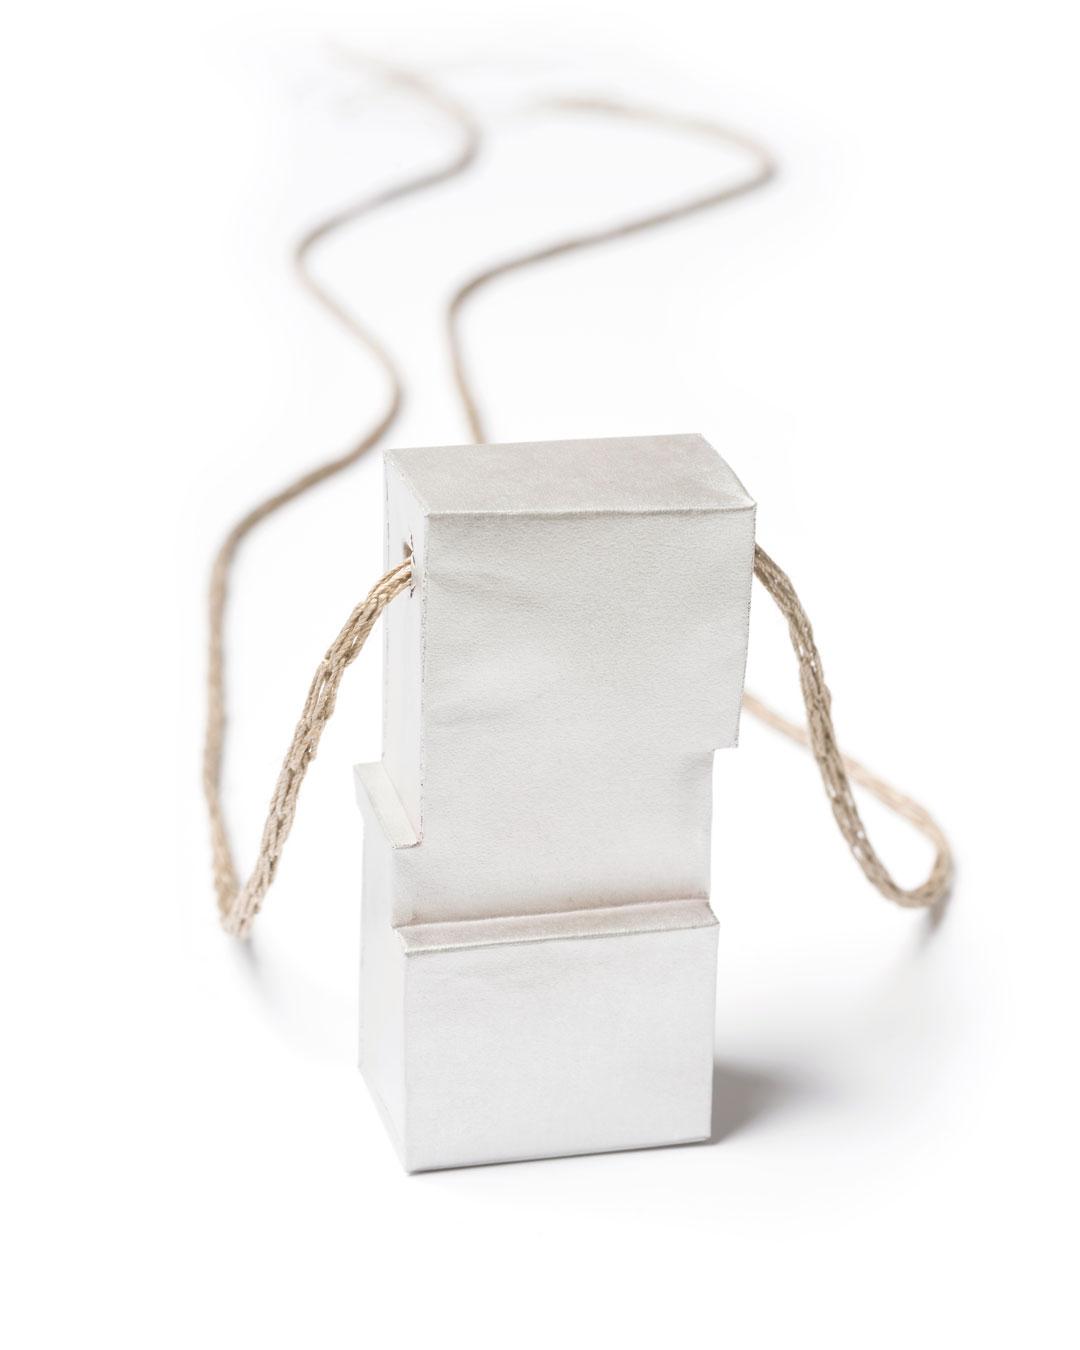 Carla Nuis, Unfurl 9, 2018, pendant; fine silver, linen, 57 x 29 x 20 mm, €710